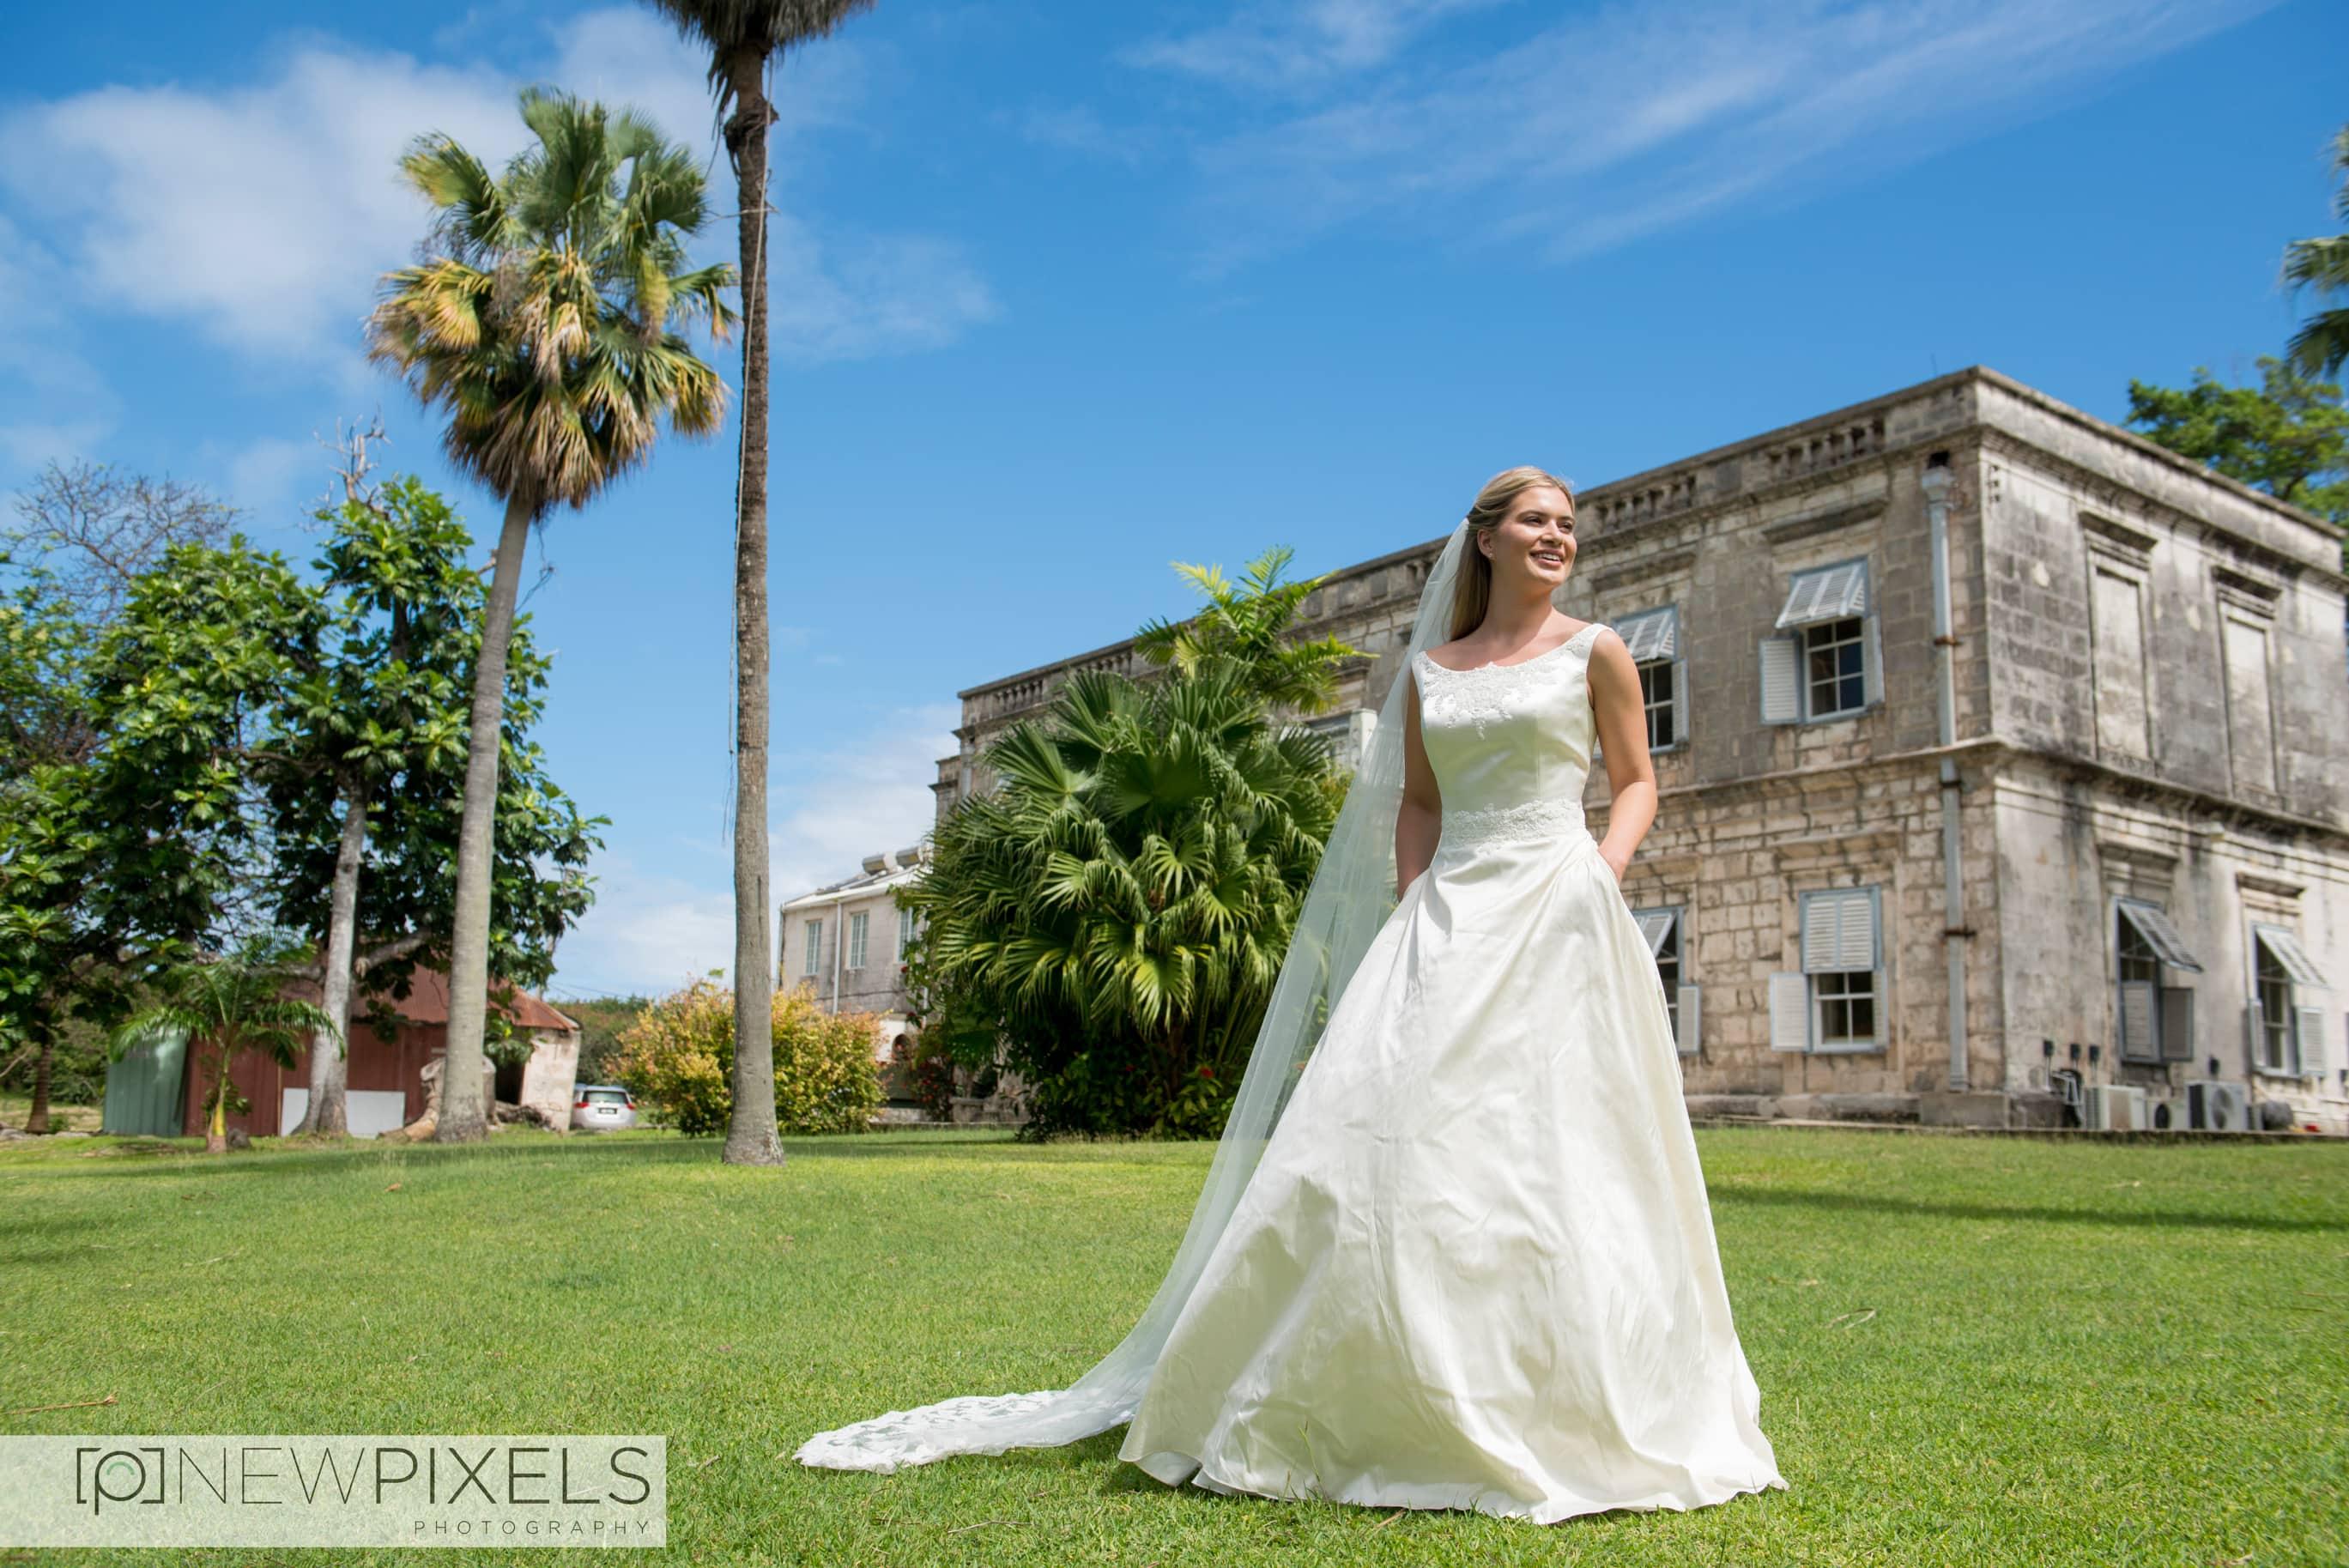 Destination Wedding Photographer- New Pixels-20